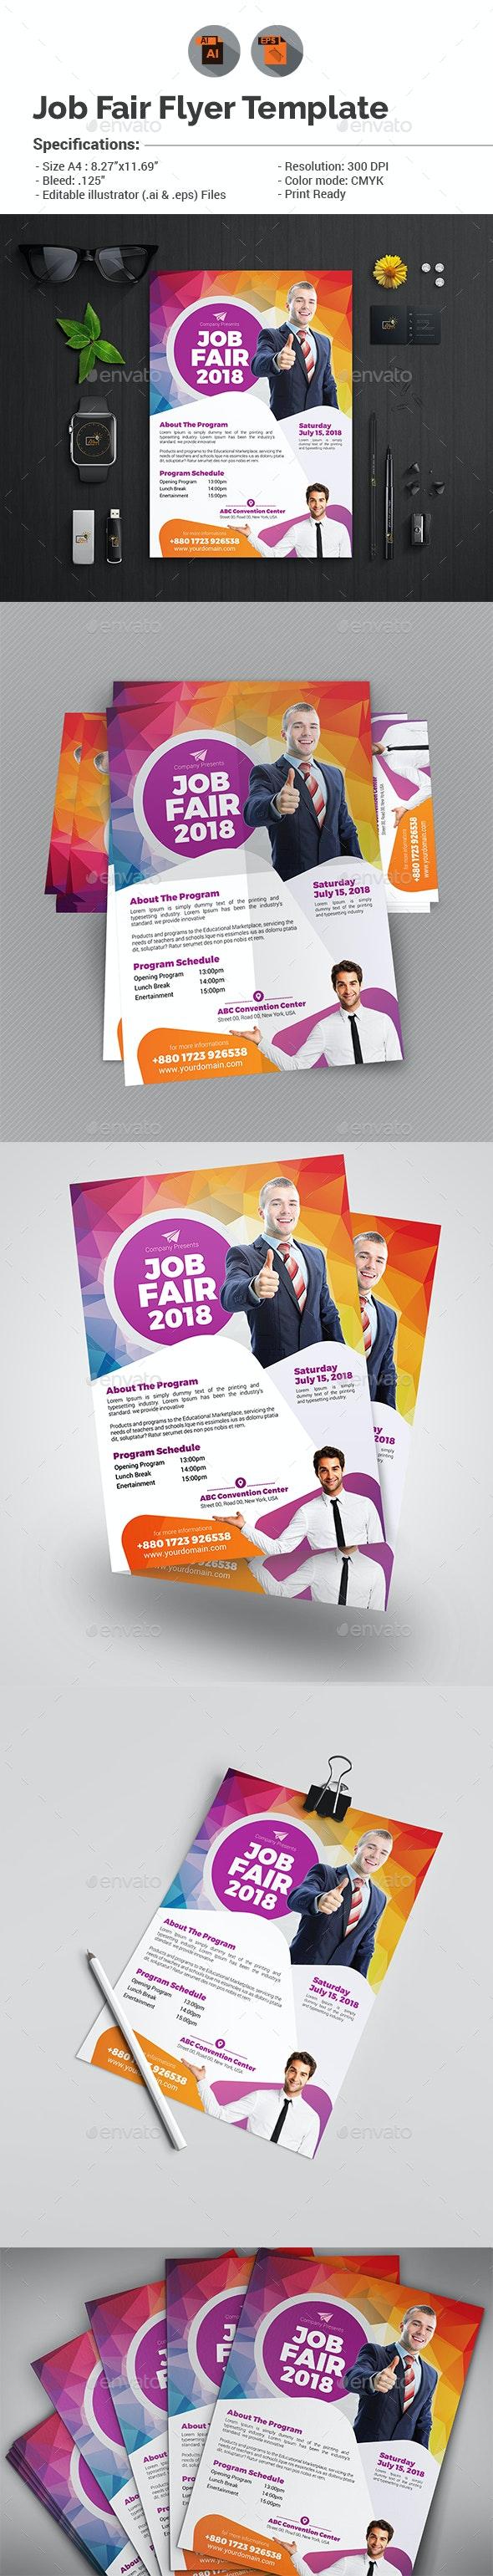 Job Fair Flyer Template V2 - Events Flyers